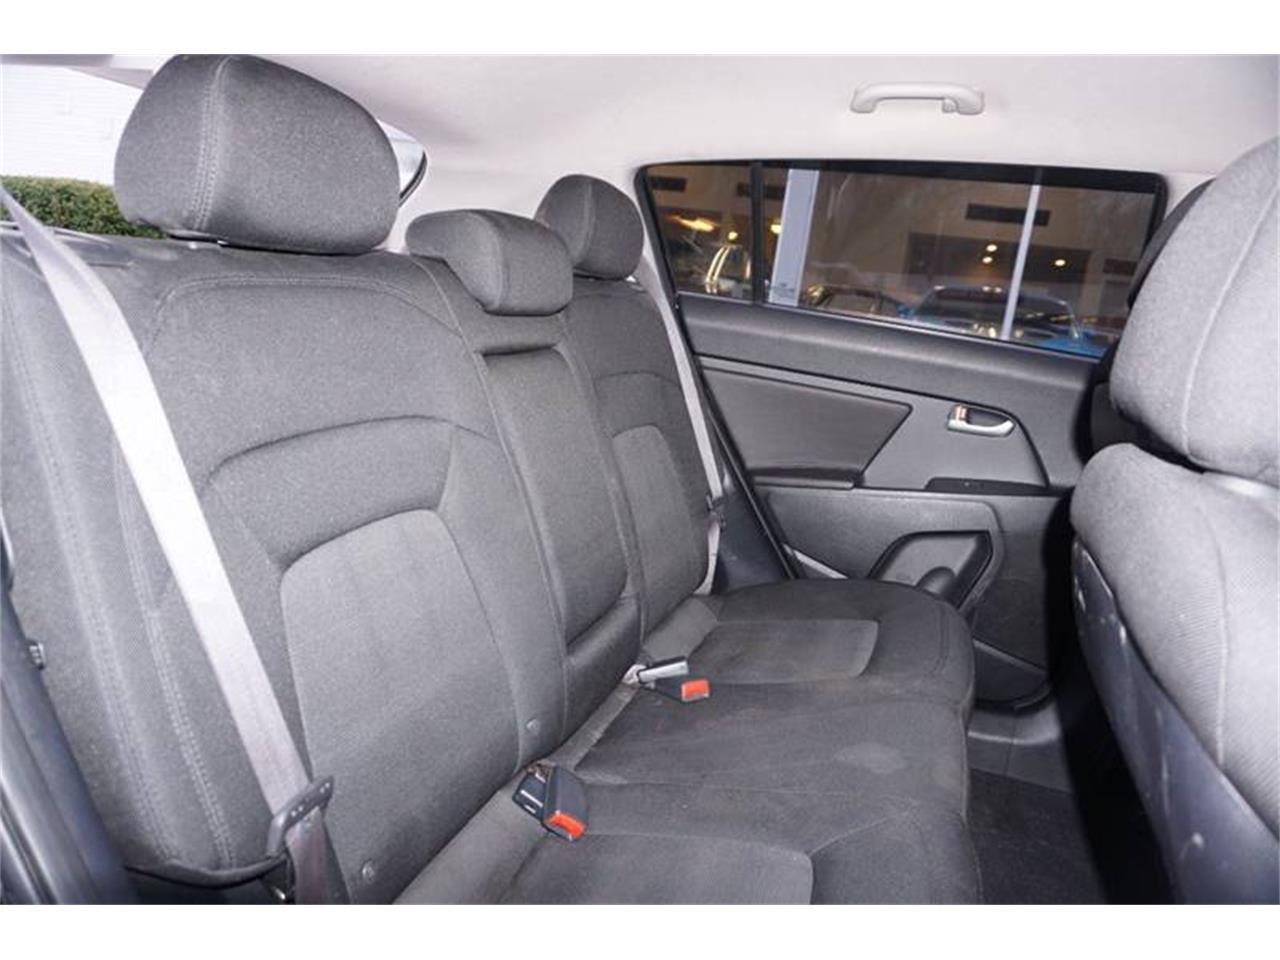 Large Picture of 2011 Kia Sportage located in Ohio Offered by Cincinnati Auto Wholesale - MODN